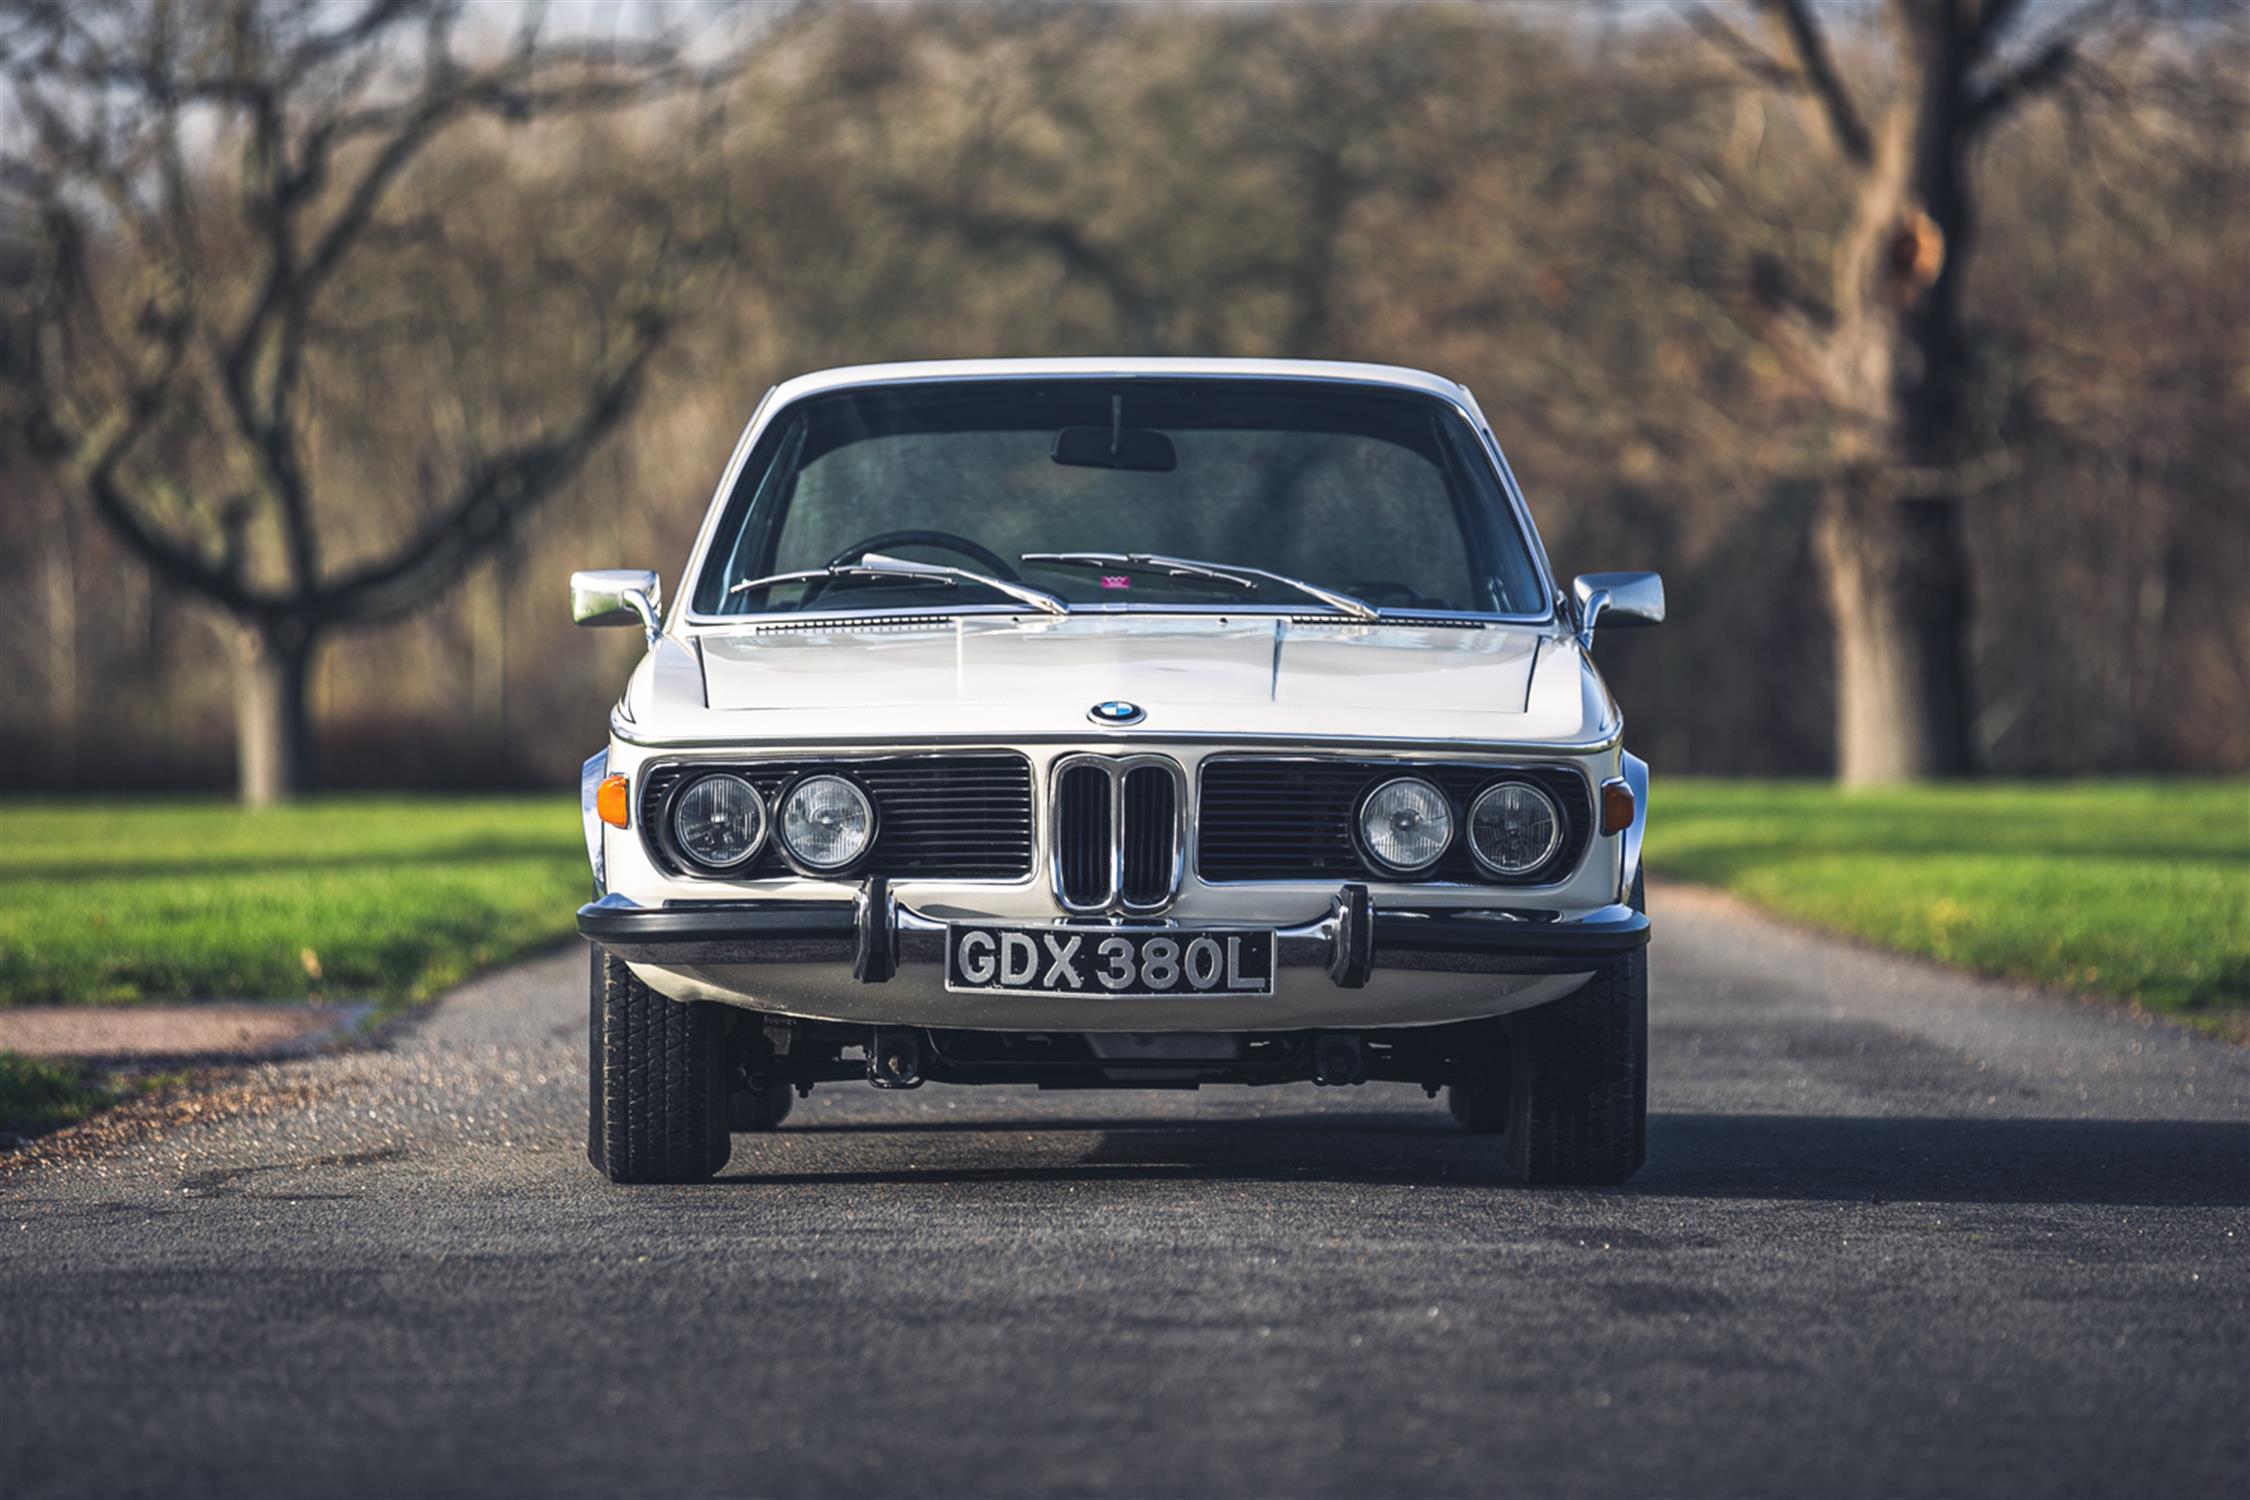 1973 BMW 3.0 CSL - Image 6 of 10